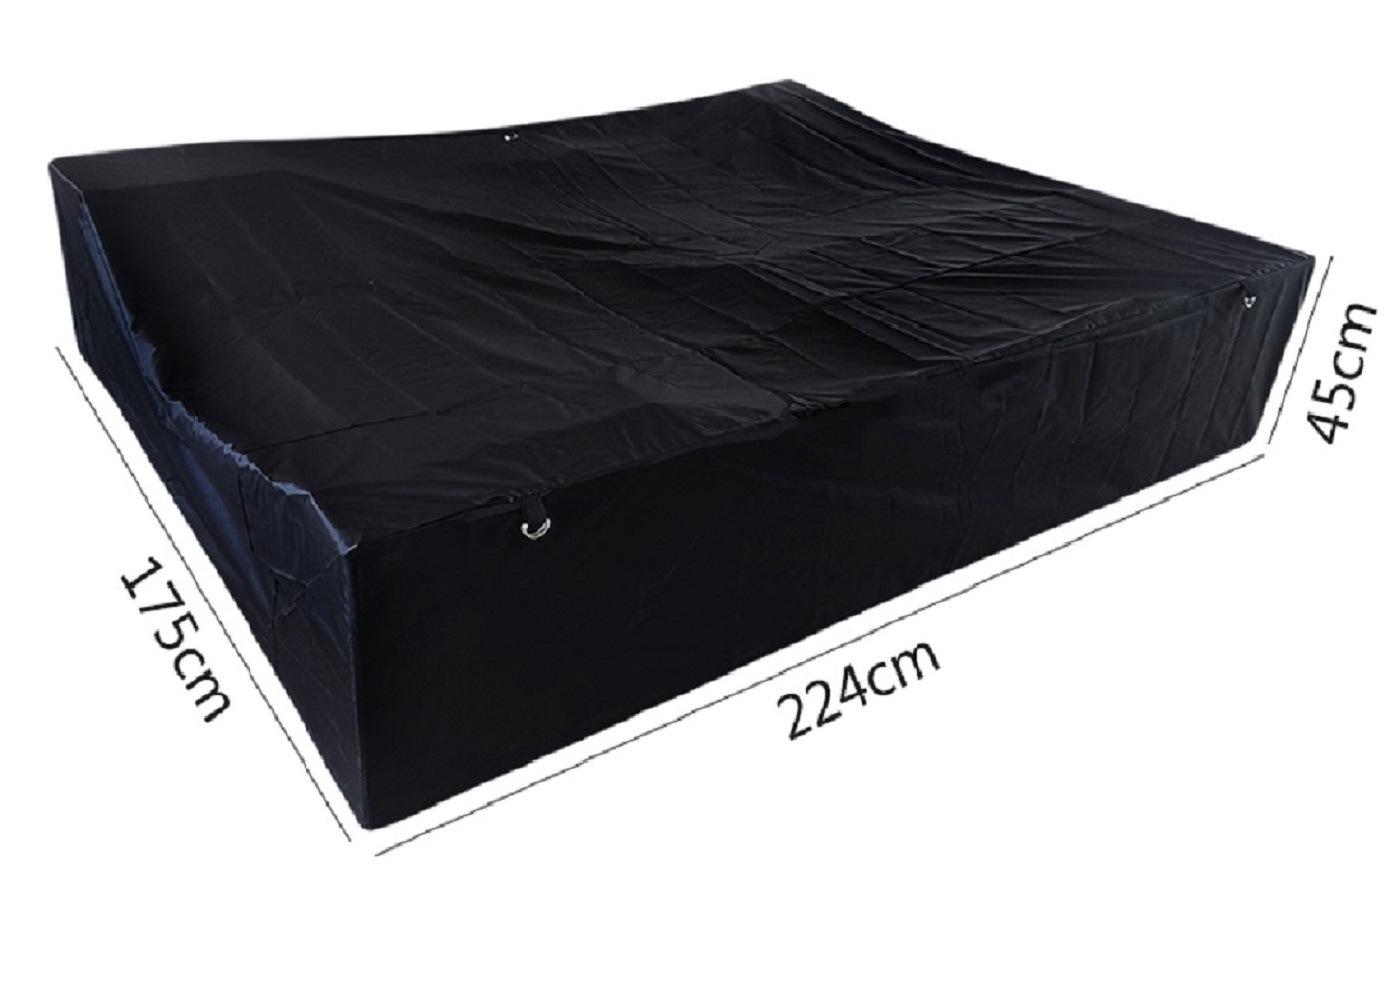 Black Hue Vehicle Cover for Waterproof and Dustproof